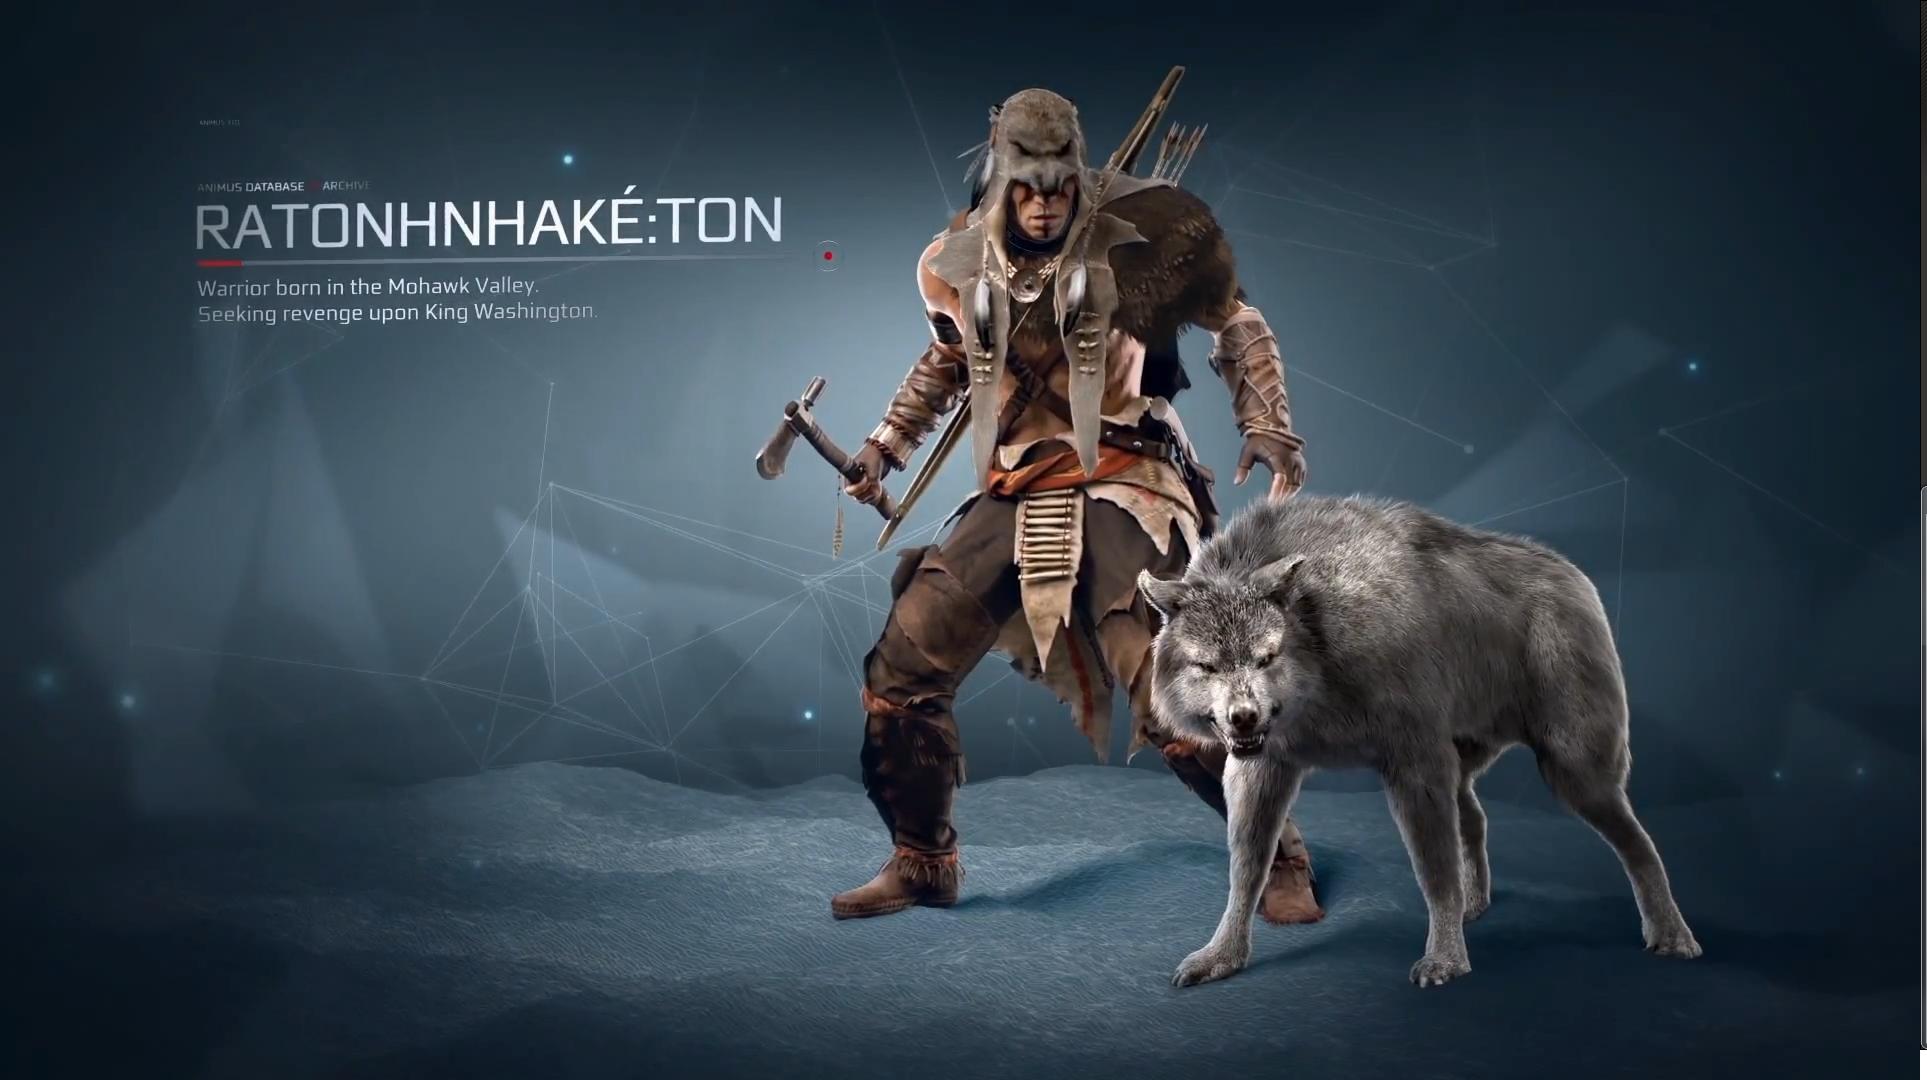 ratonhnhaketon assassins creed 3 - photo #3